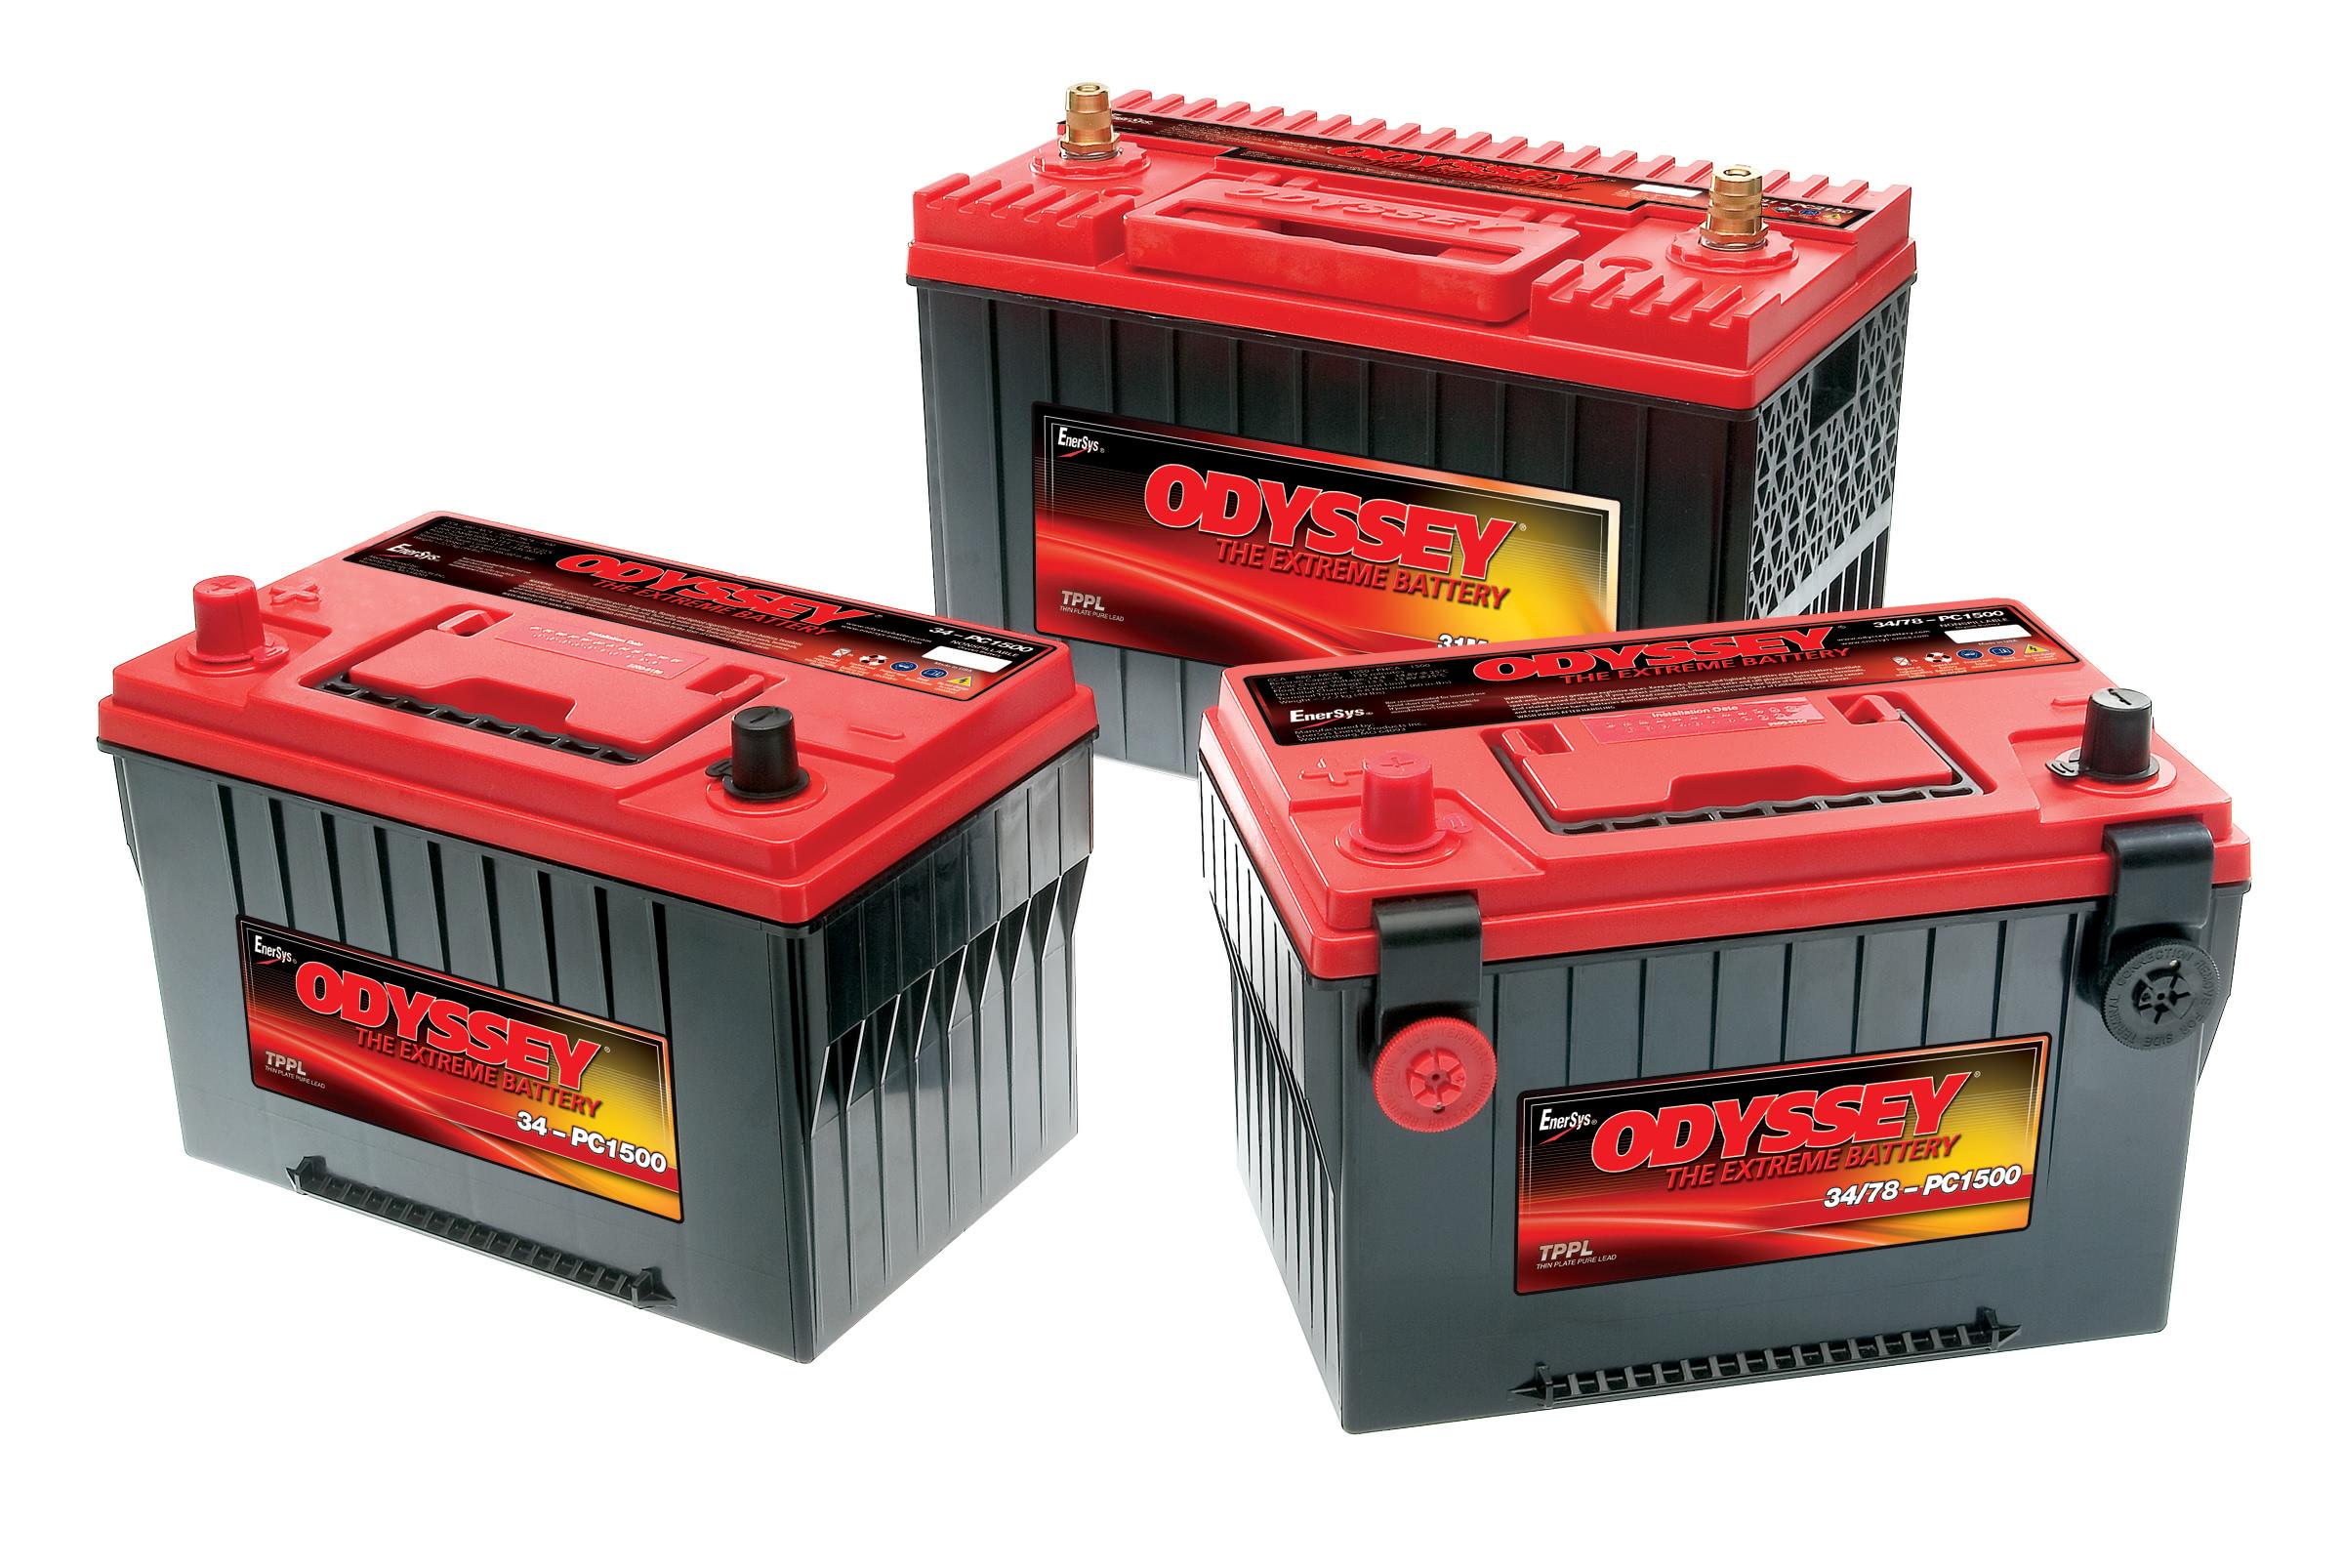 Аккумуляторы ODYSSEY Extreme / Одиссей Экстрим премиум класса (premium)